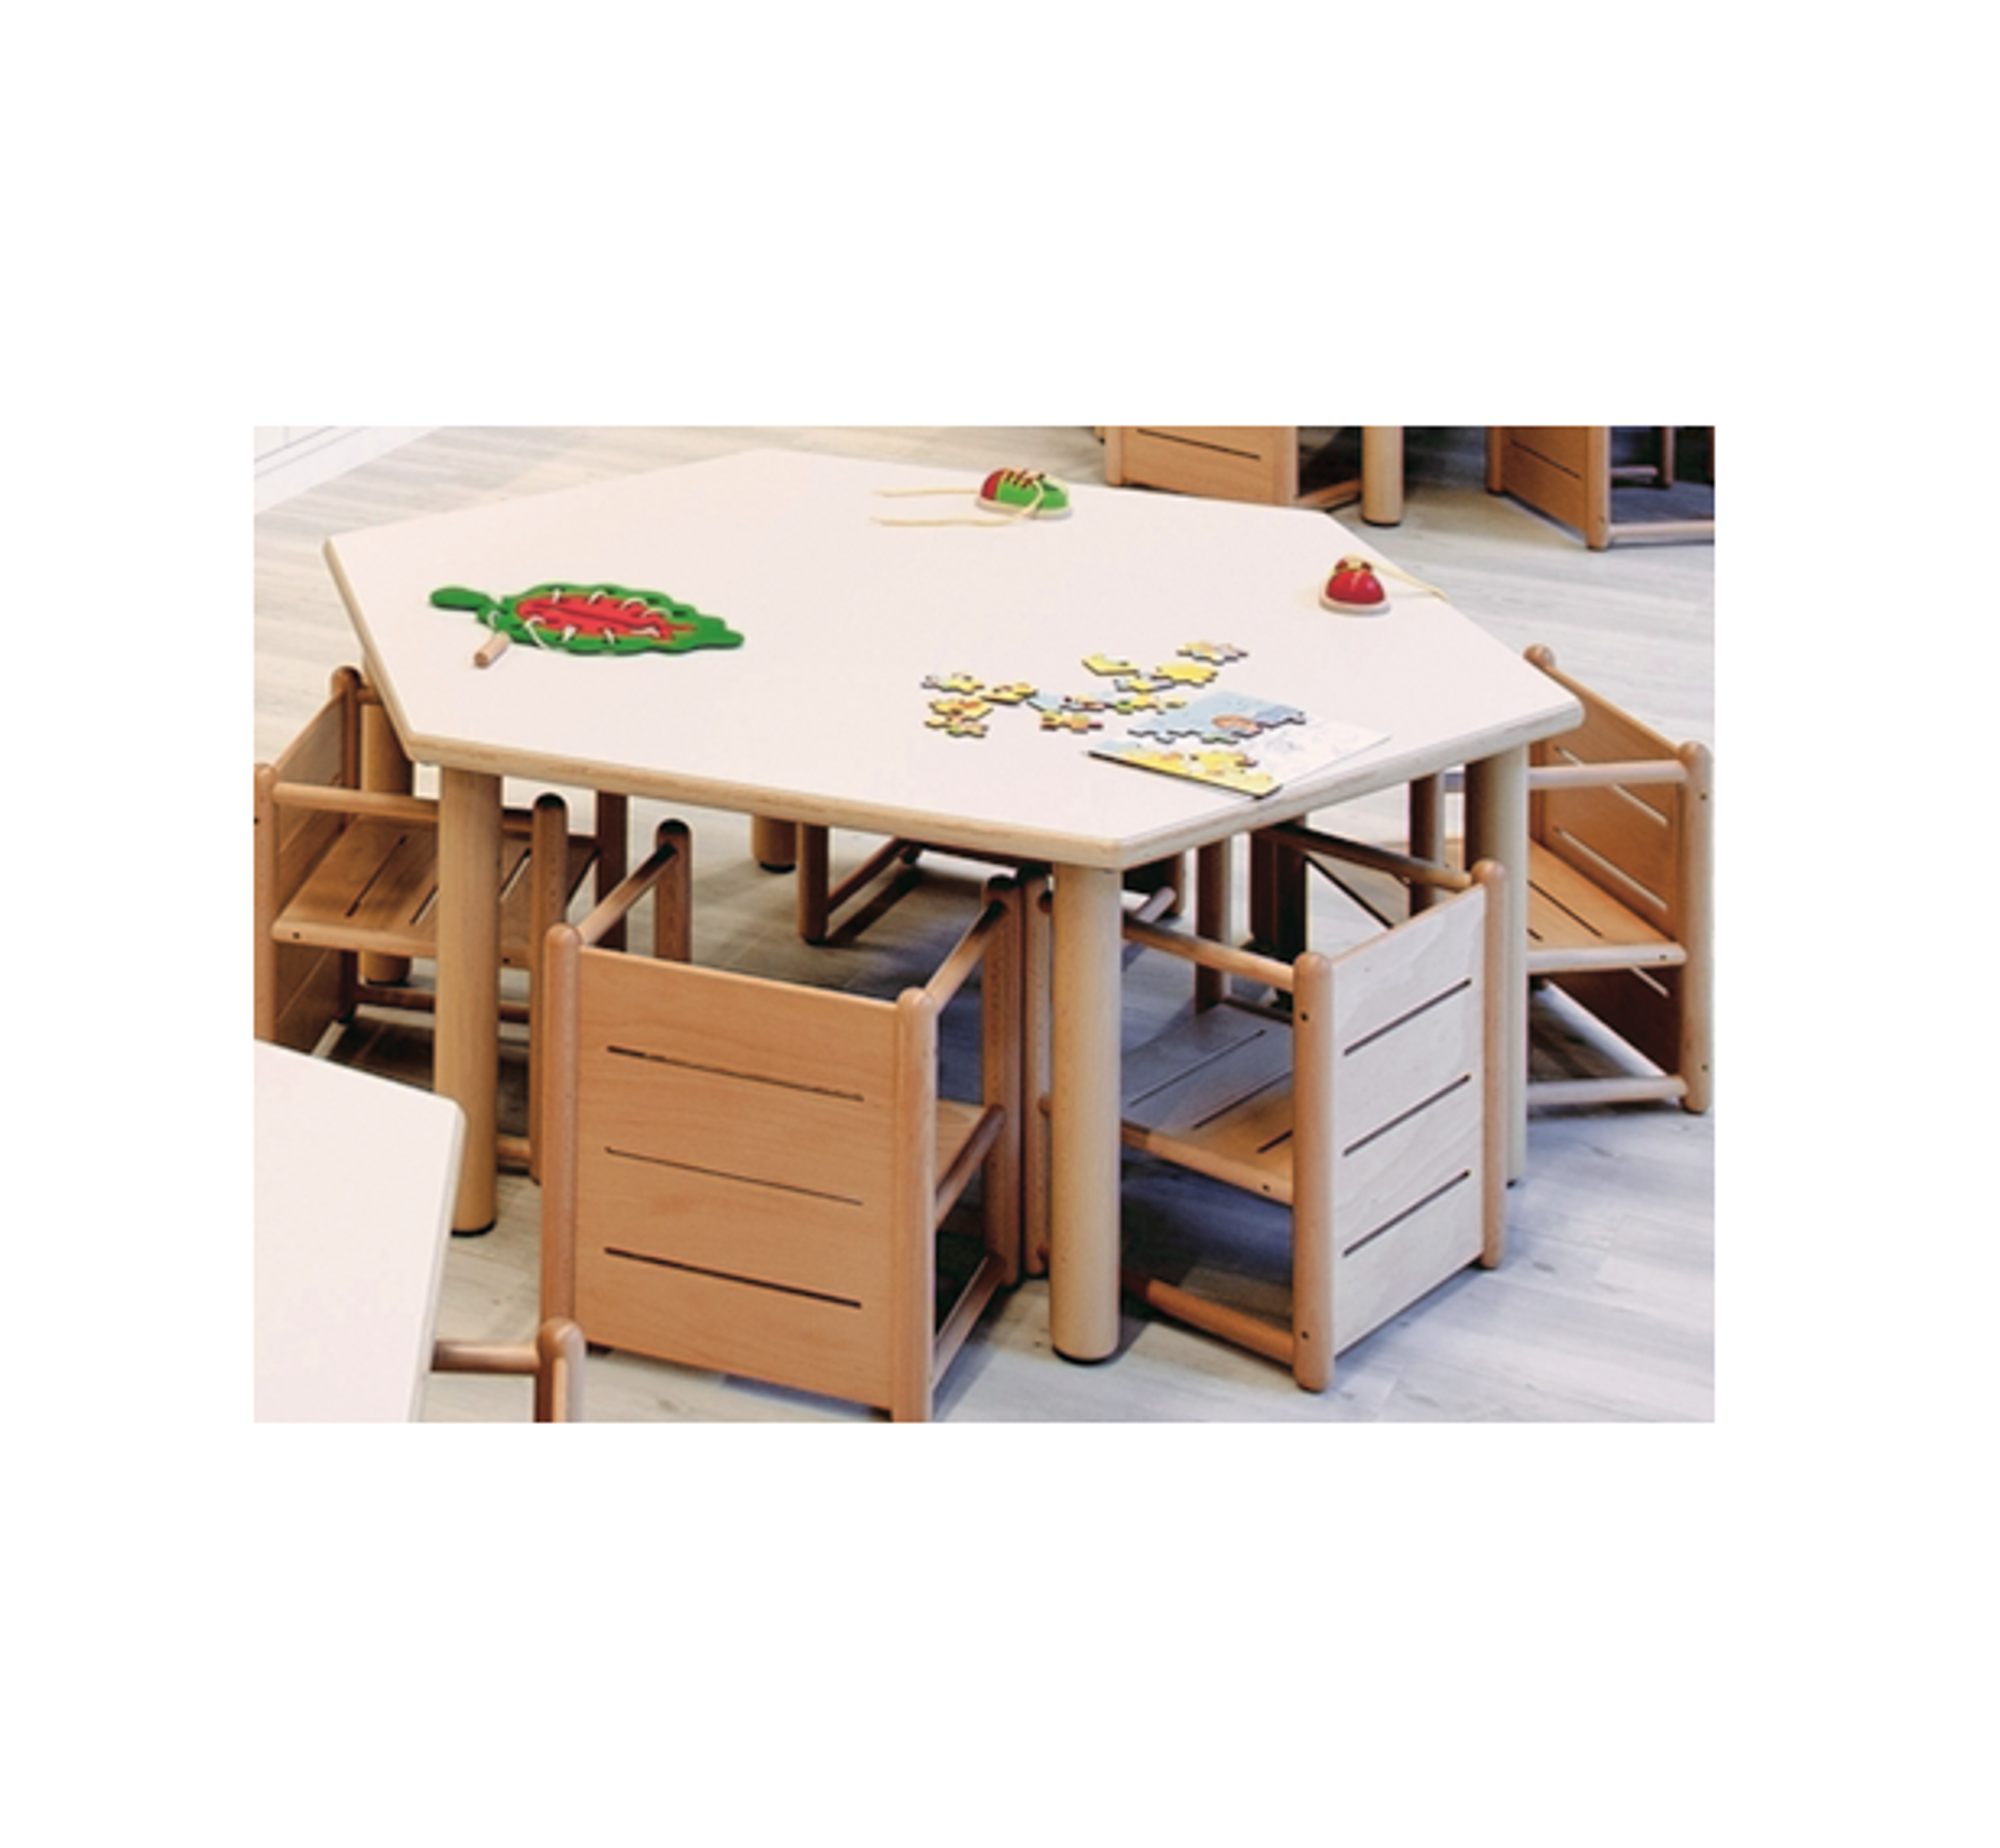 Hexagonal Table 128W X 111D X 40H (cm)